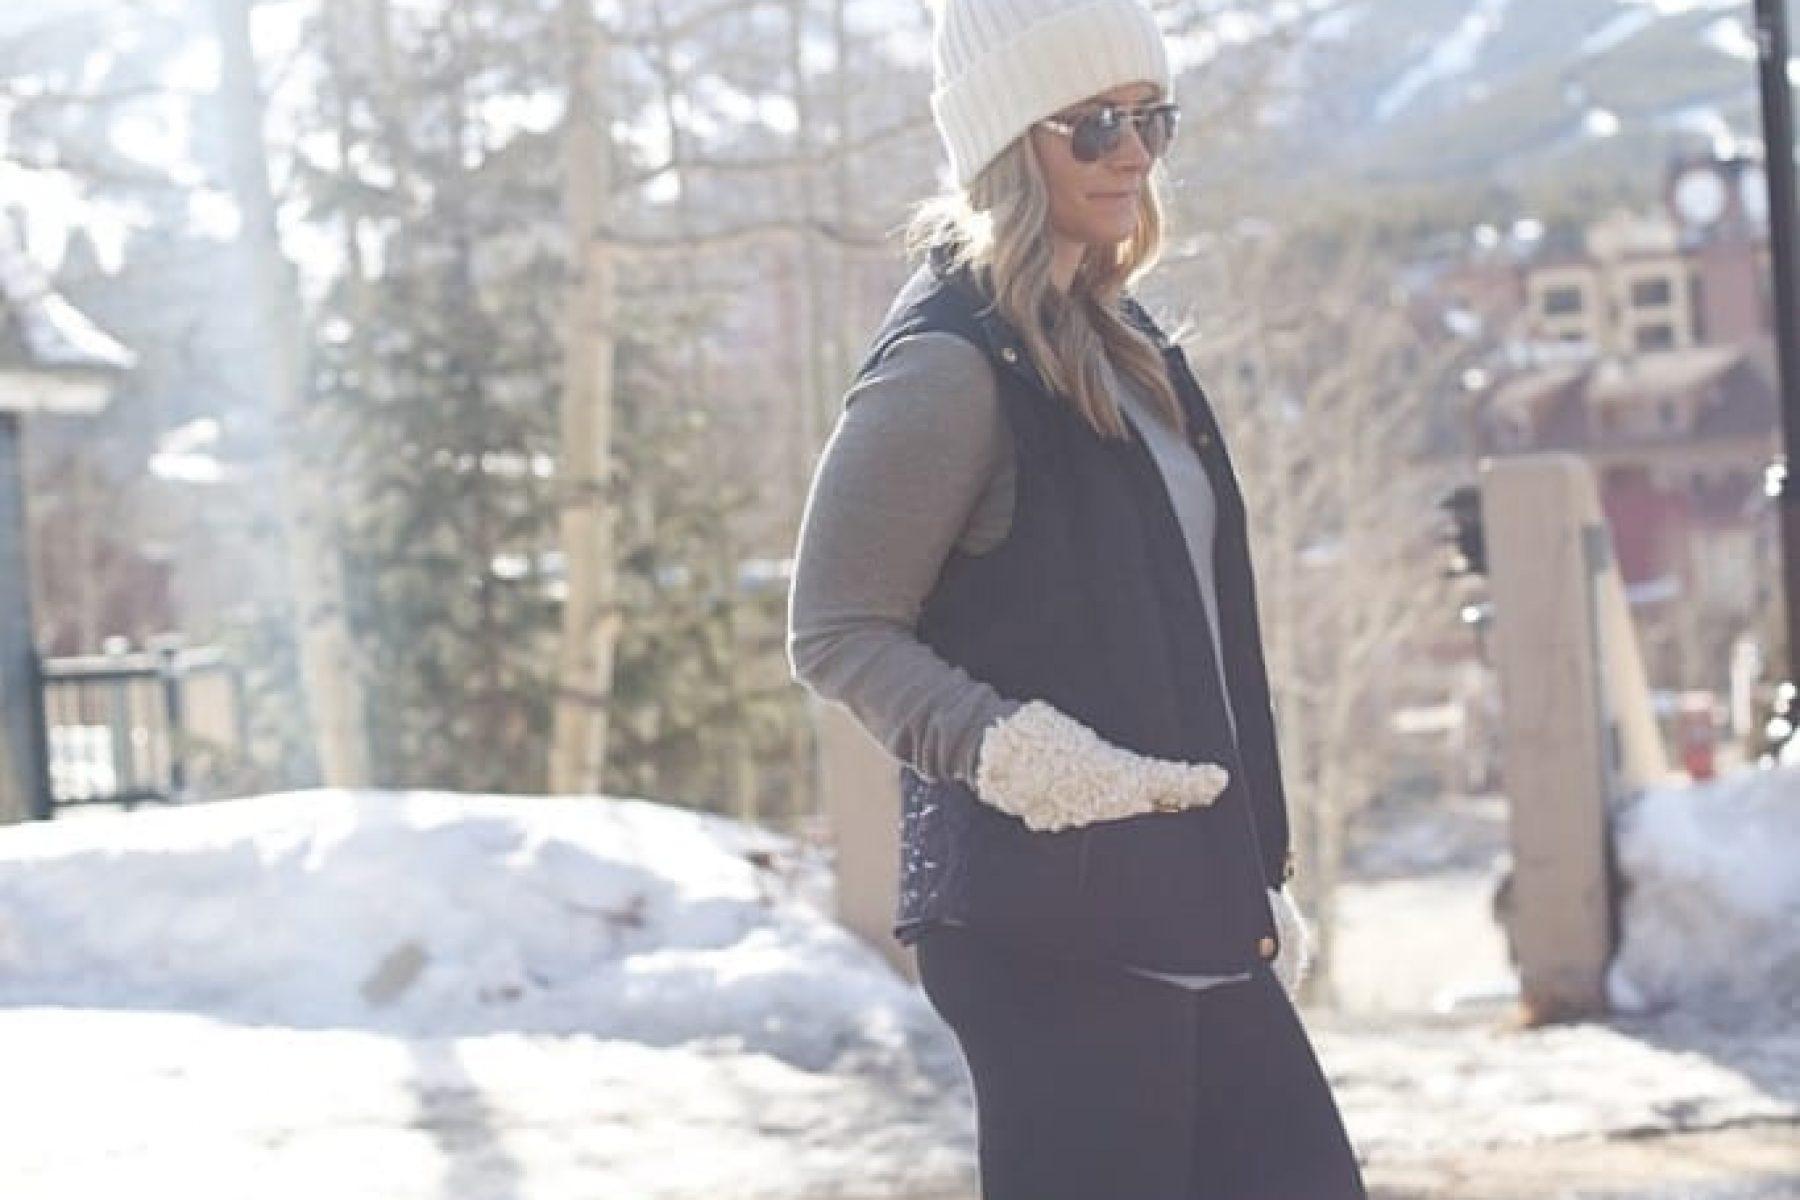 Blogger, Breckenridge, Travel, Vacation, Colorado, Ray Ban Sunglasses, Vest, Sorel Boots (2 of 6)